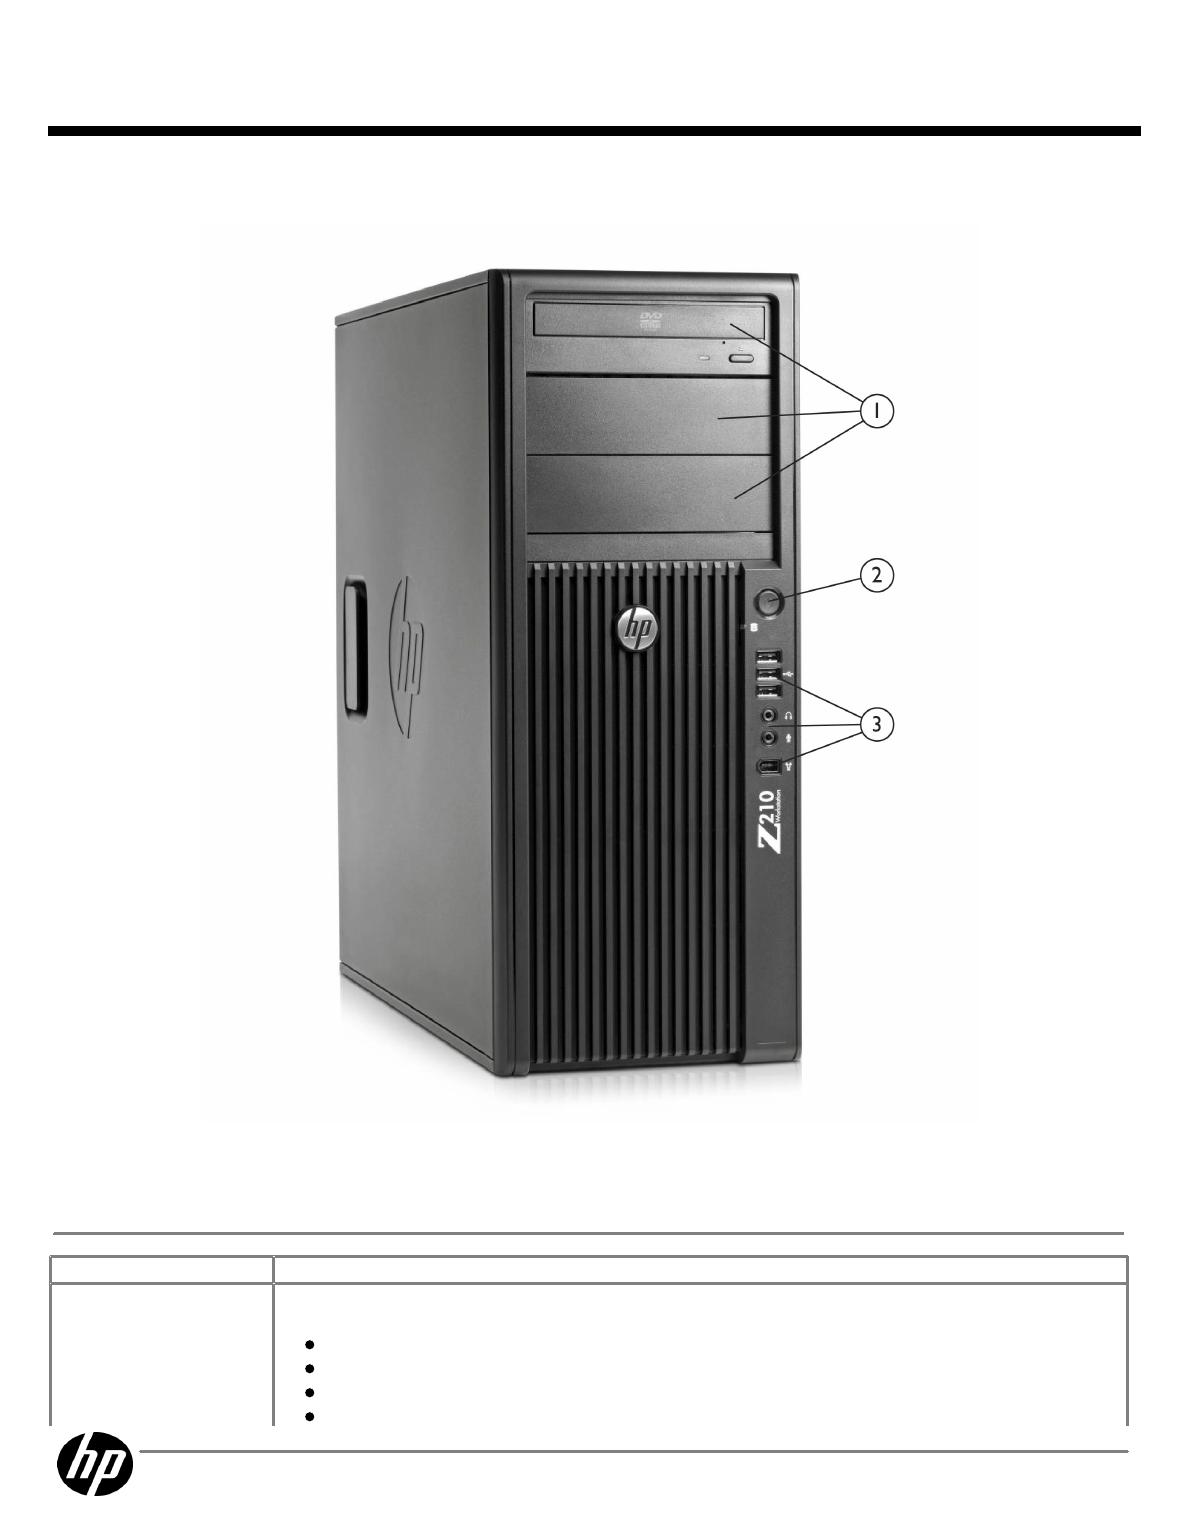 QuickSpecs HP Z210 CMT Workstation